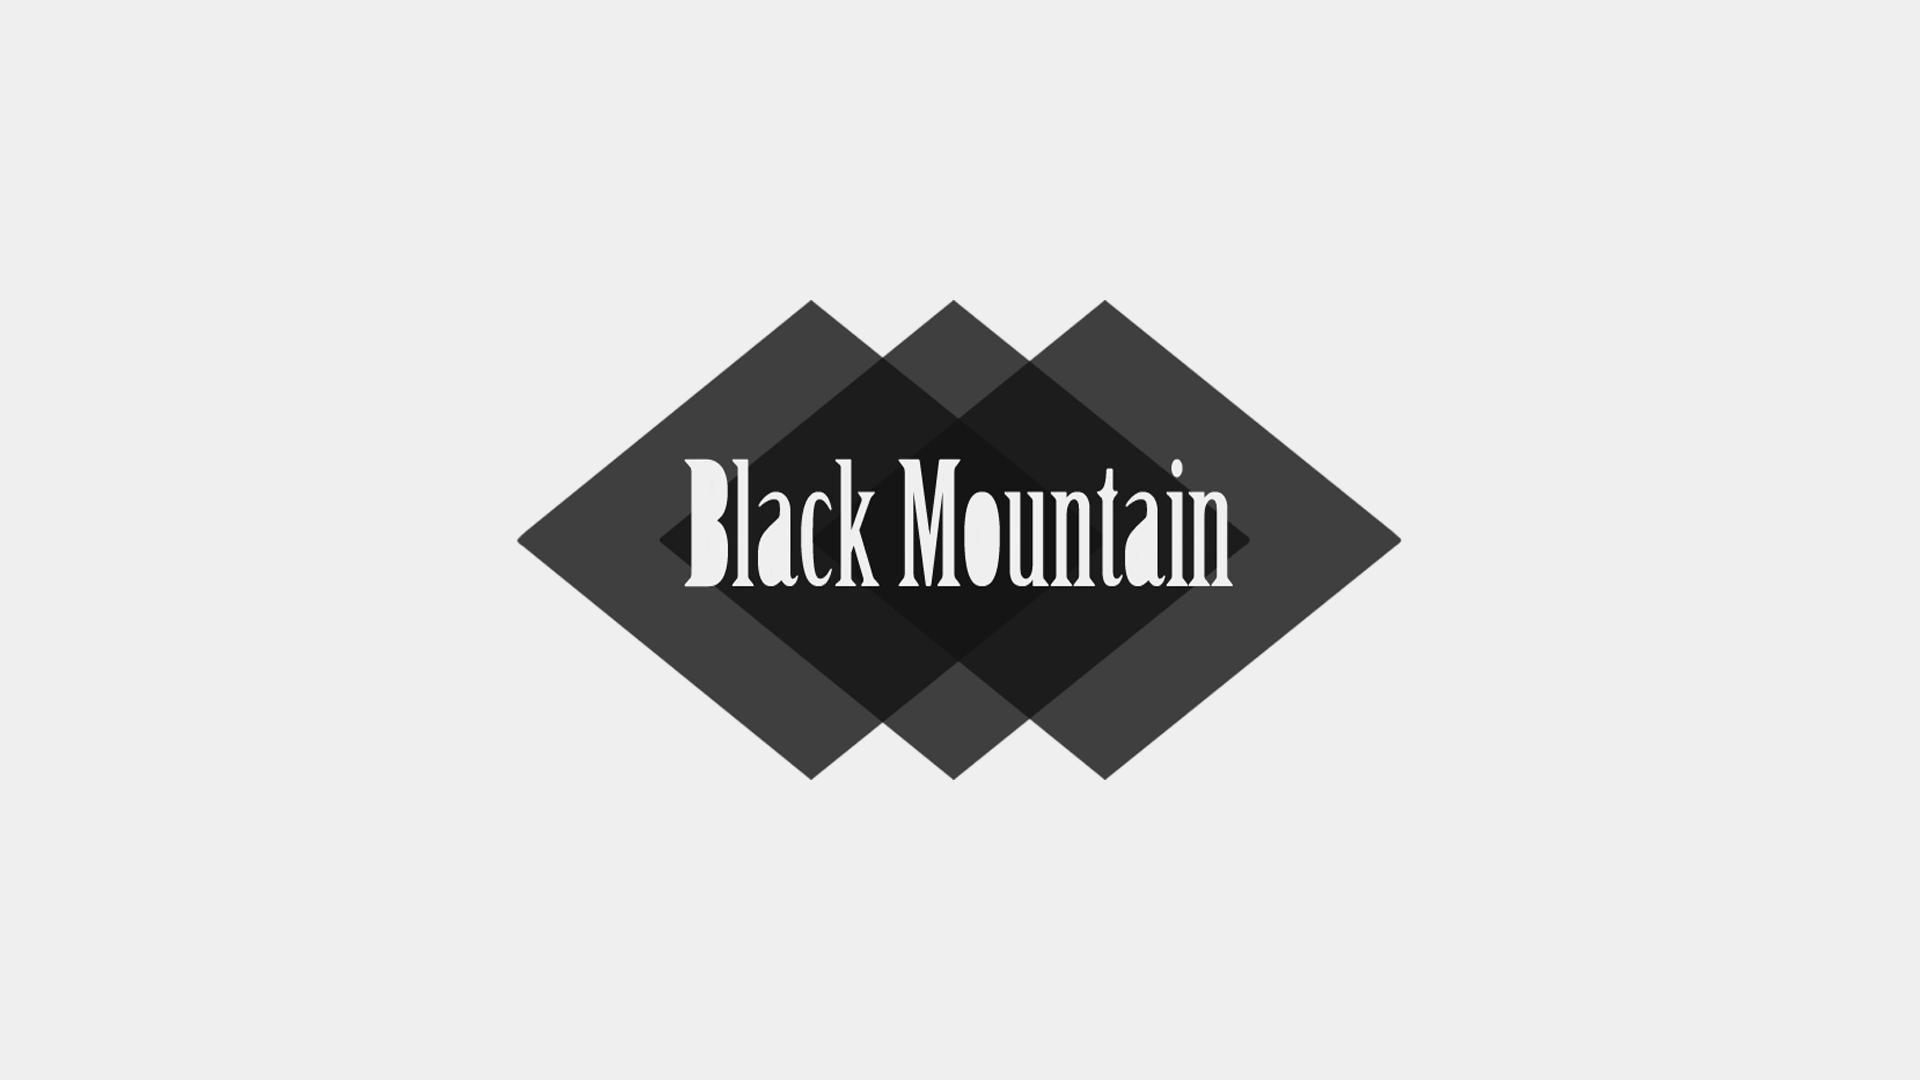 General 1920x1080 music black mountain black